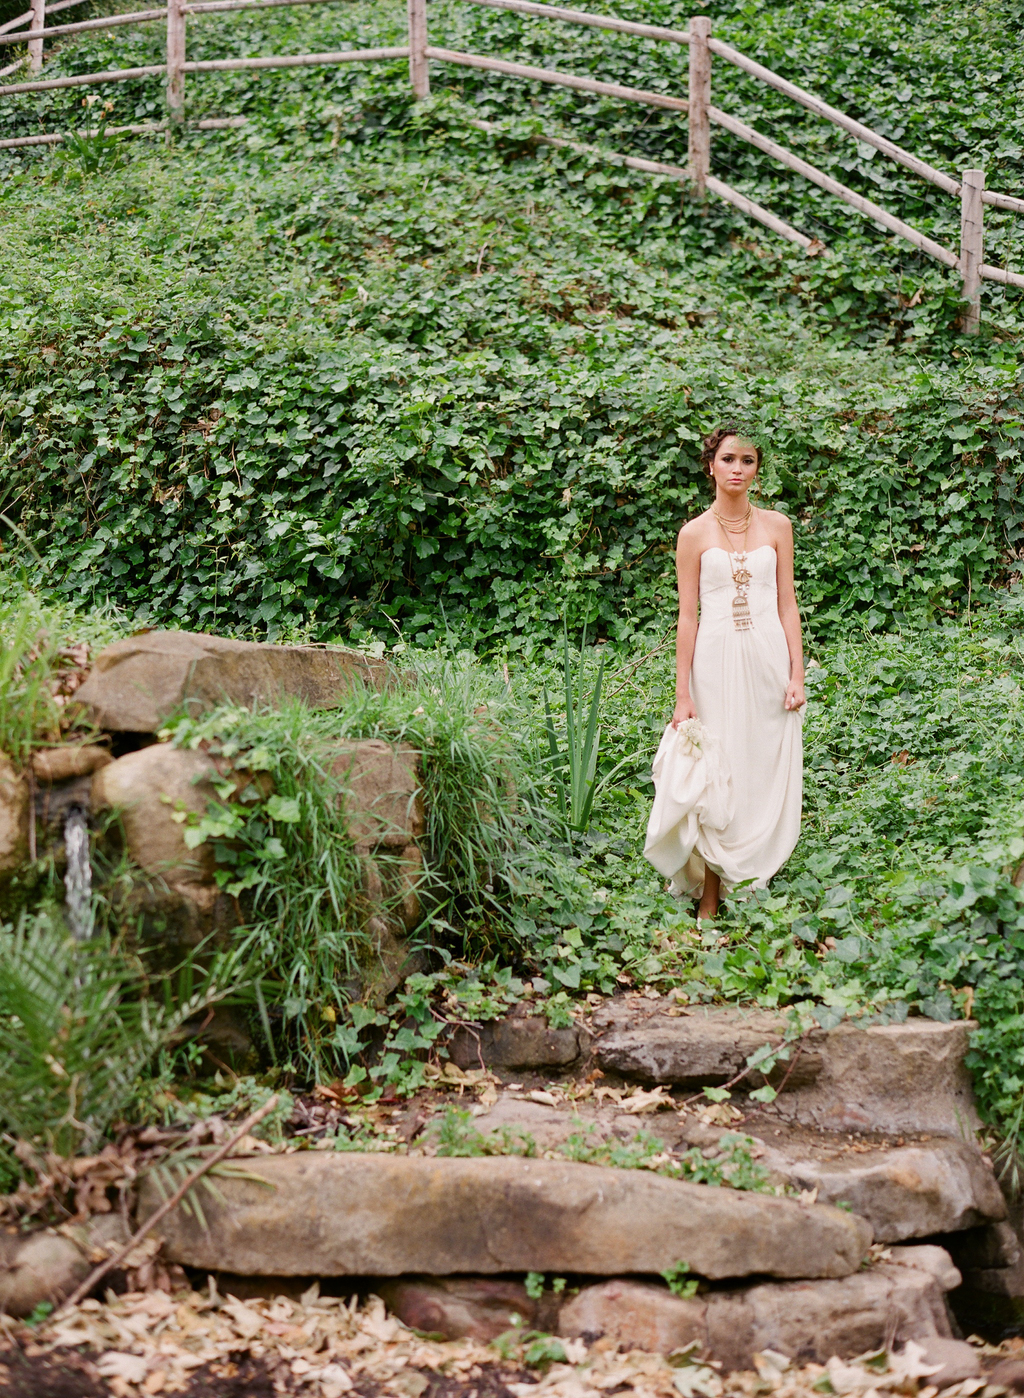 Styled-wedding-santa-barbara-chic-beaux-arts-photographie-italian-bohemian-wedding-bride-wedding-dress-022.full